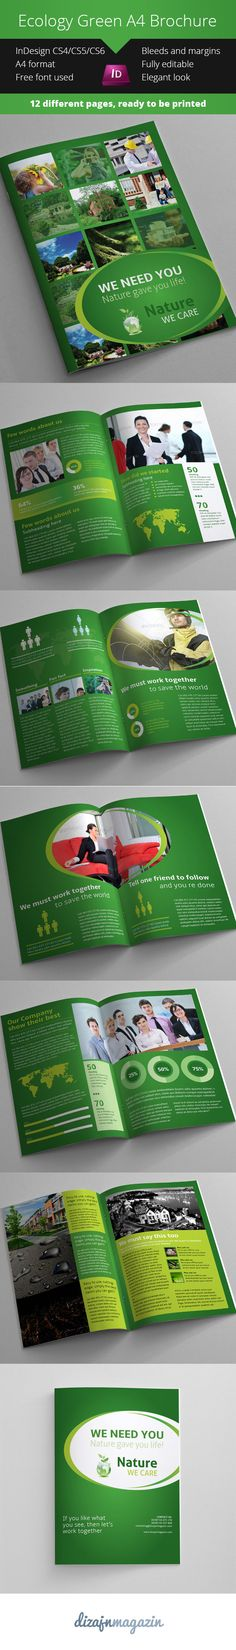 Free Nature Brochure A4 Format – InDesign Template | VrbicPlay - Creative studio